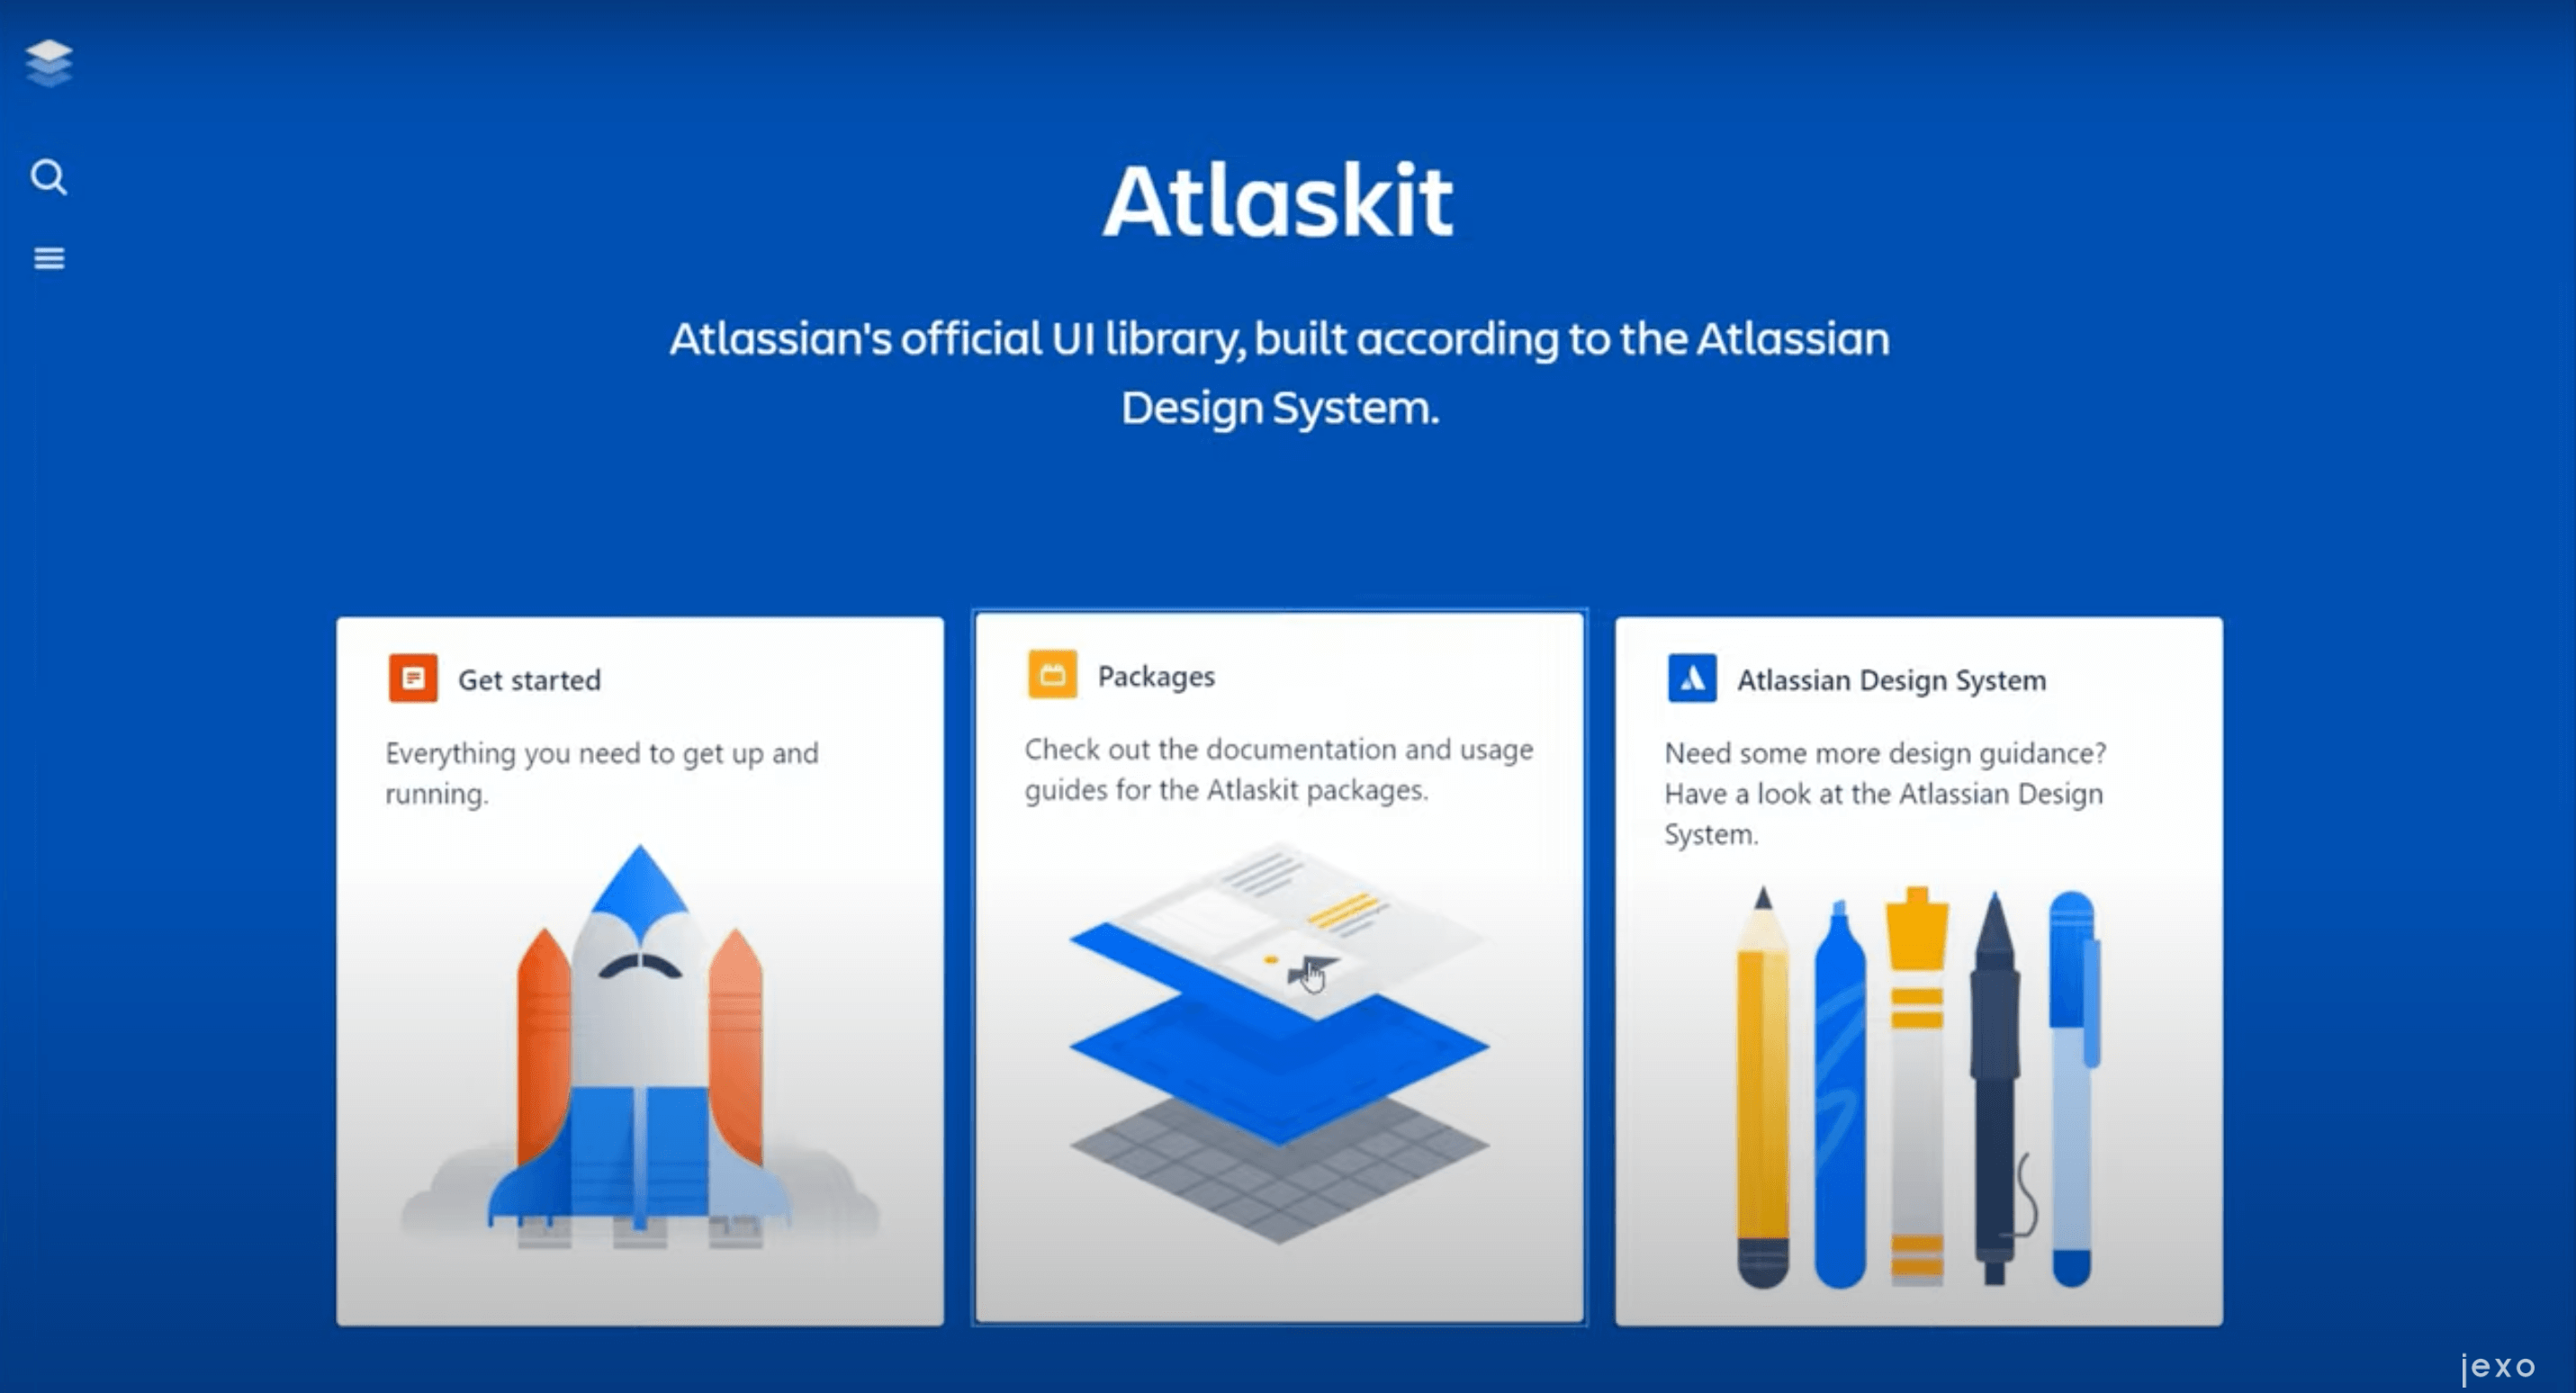 Developer tools for Atlassian Marketplace partners: Atlaskit